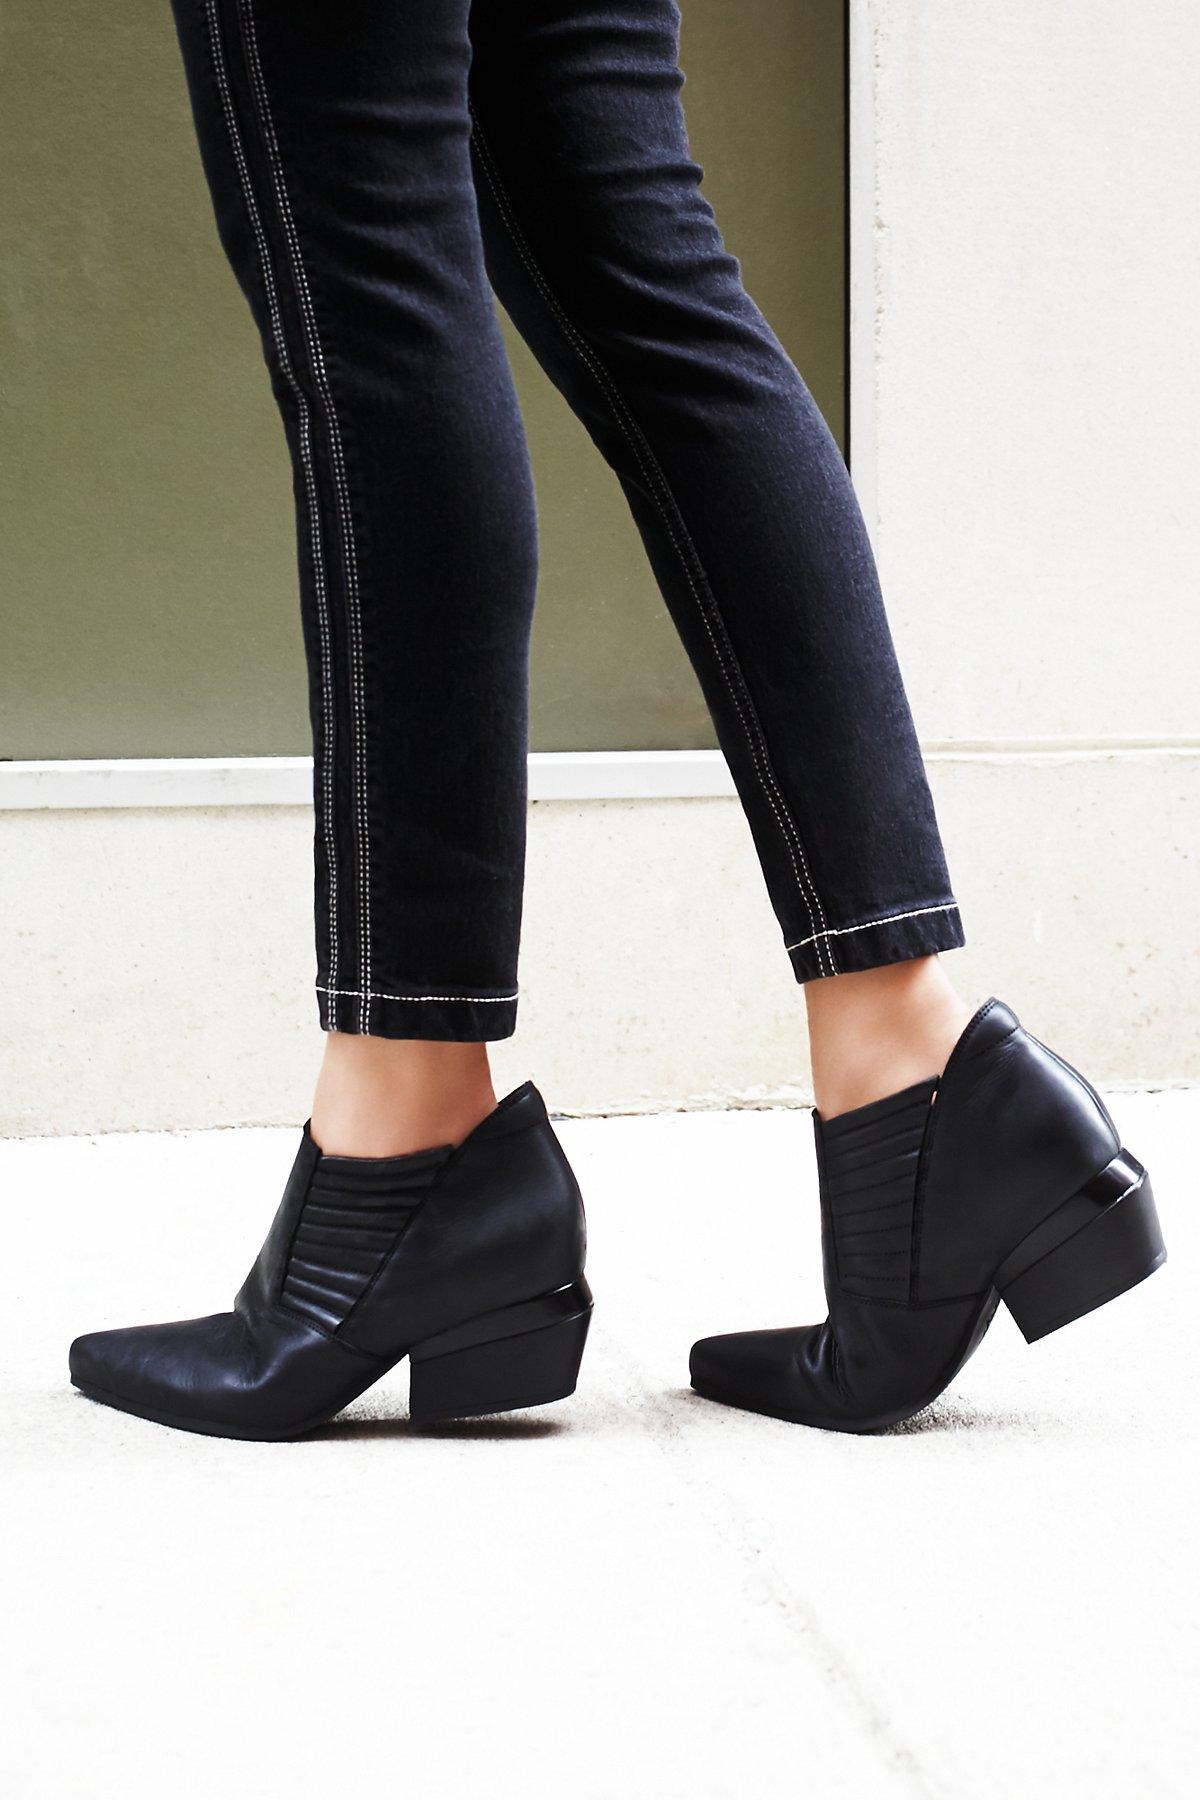 Outerbanks踝靴